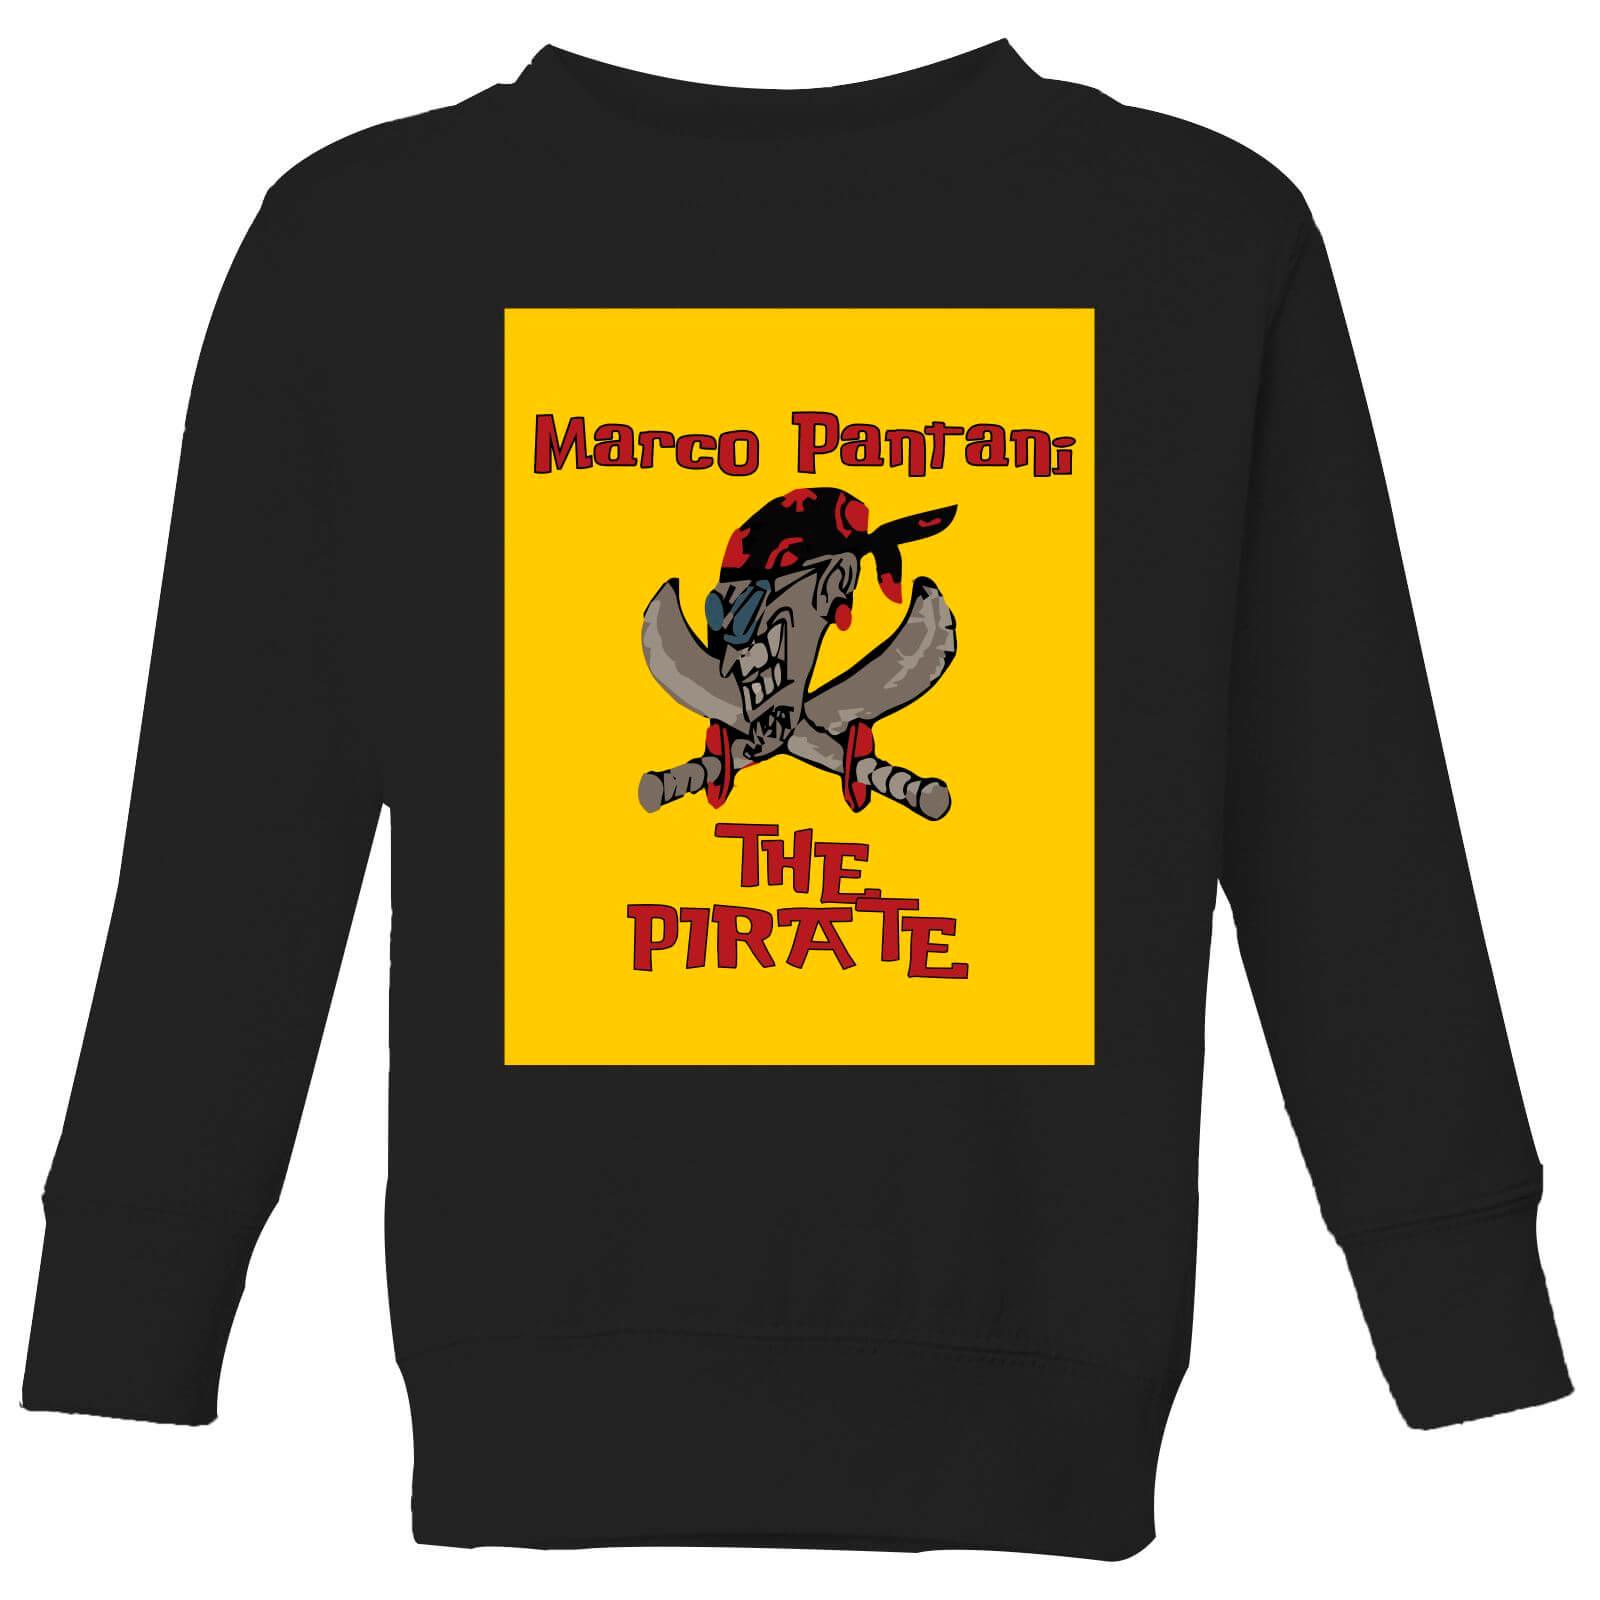 Summit Finish Pantani The Pirate Kids' Sweatshirt - Black - 7-8 Years - Black